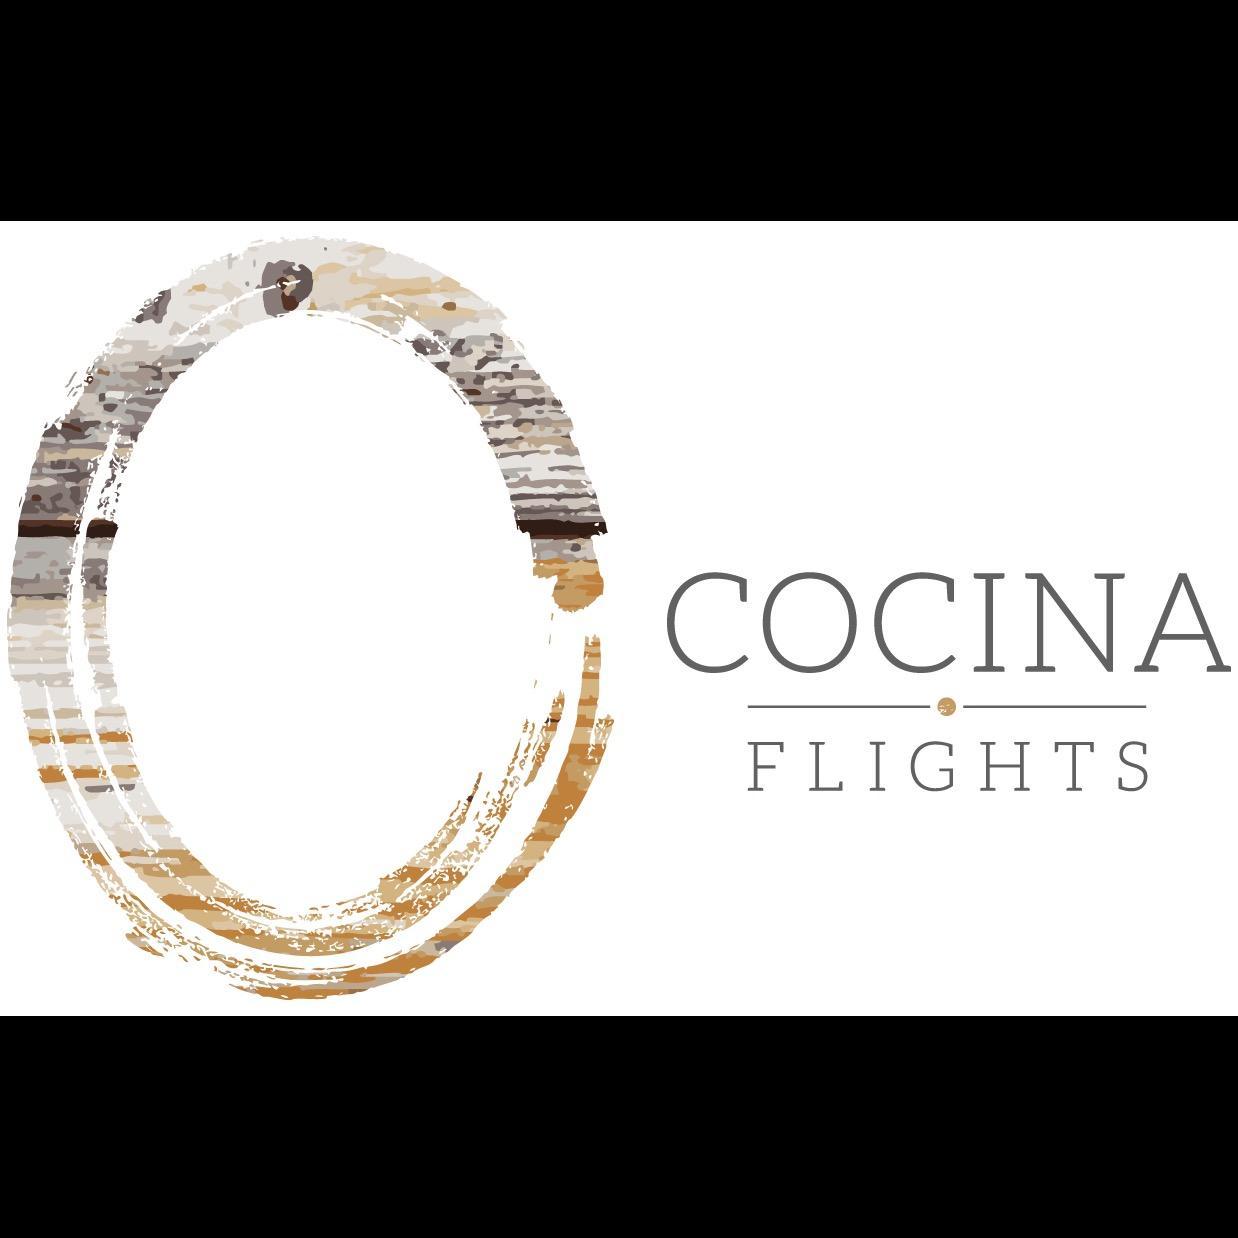 O Cocina & Flights - Tampa, FL 33629 - (813)289-0649 | ShowMeLocal.com